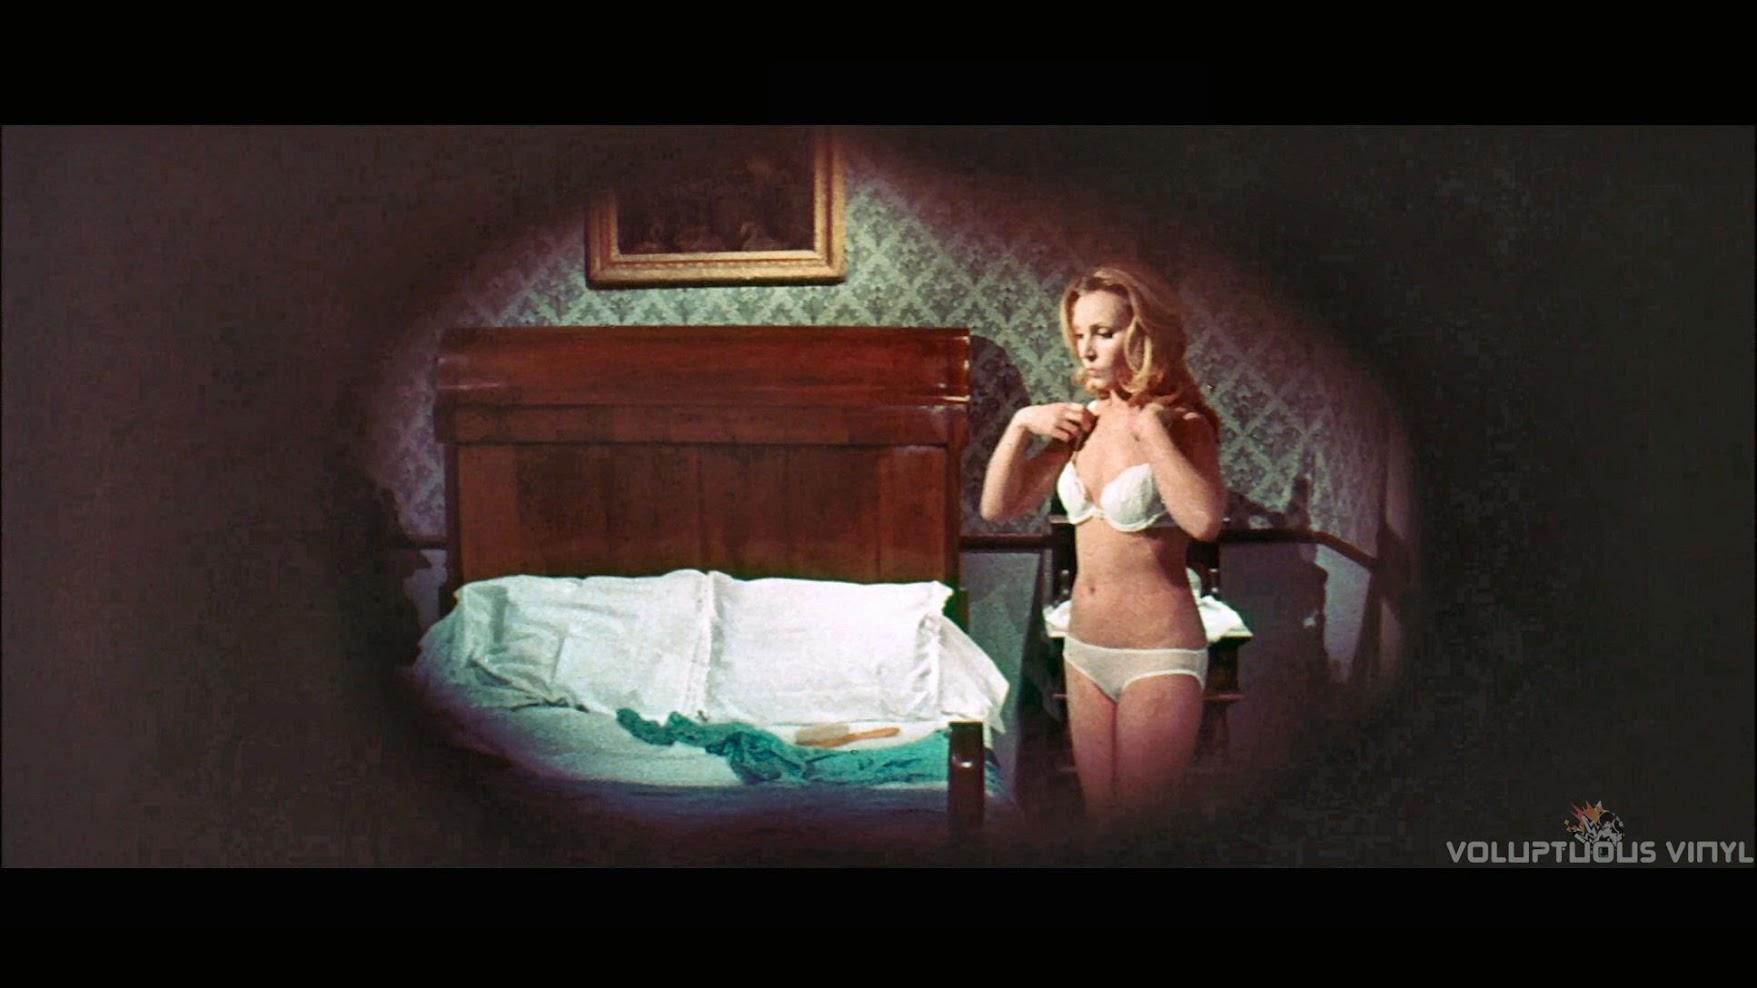 Dyanik Zurakowska being spied on while undressing in The Vampires Night Orgy